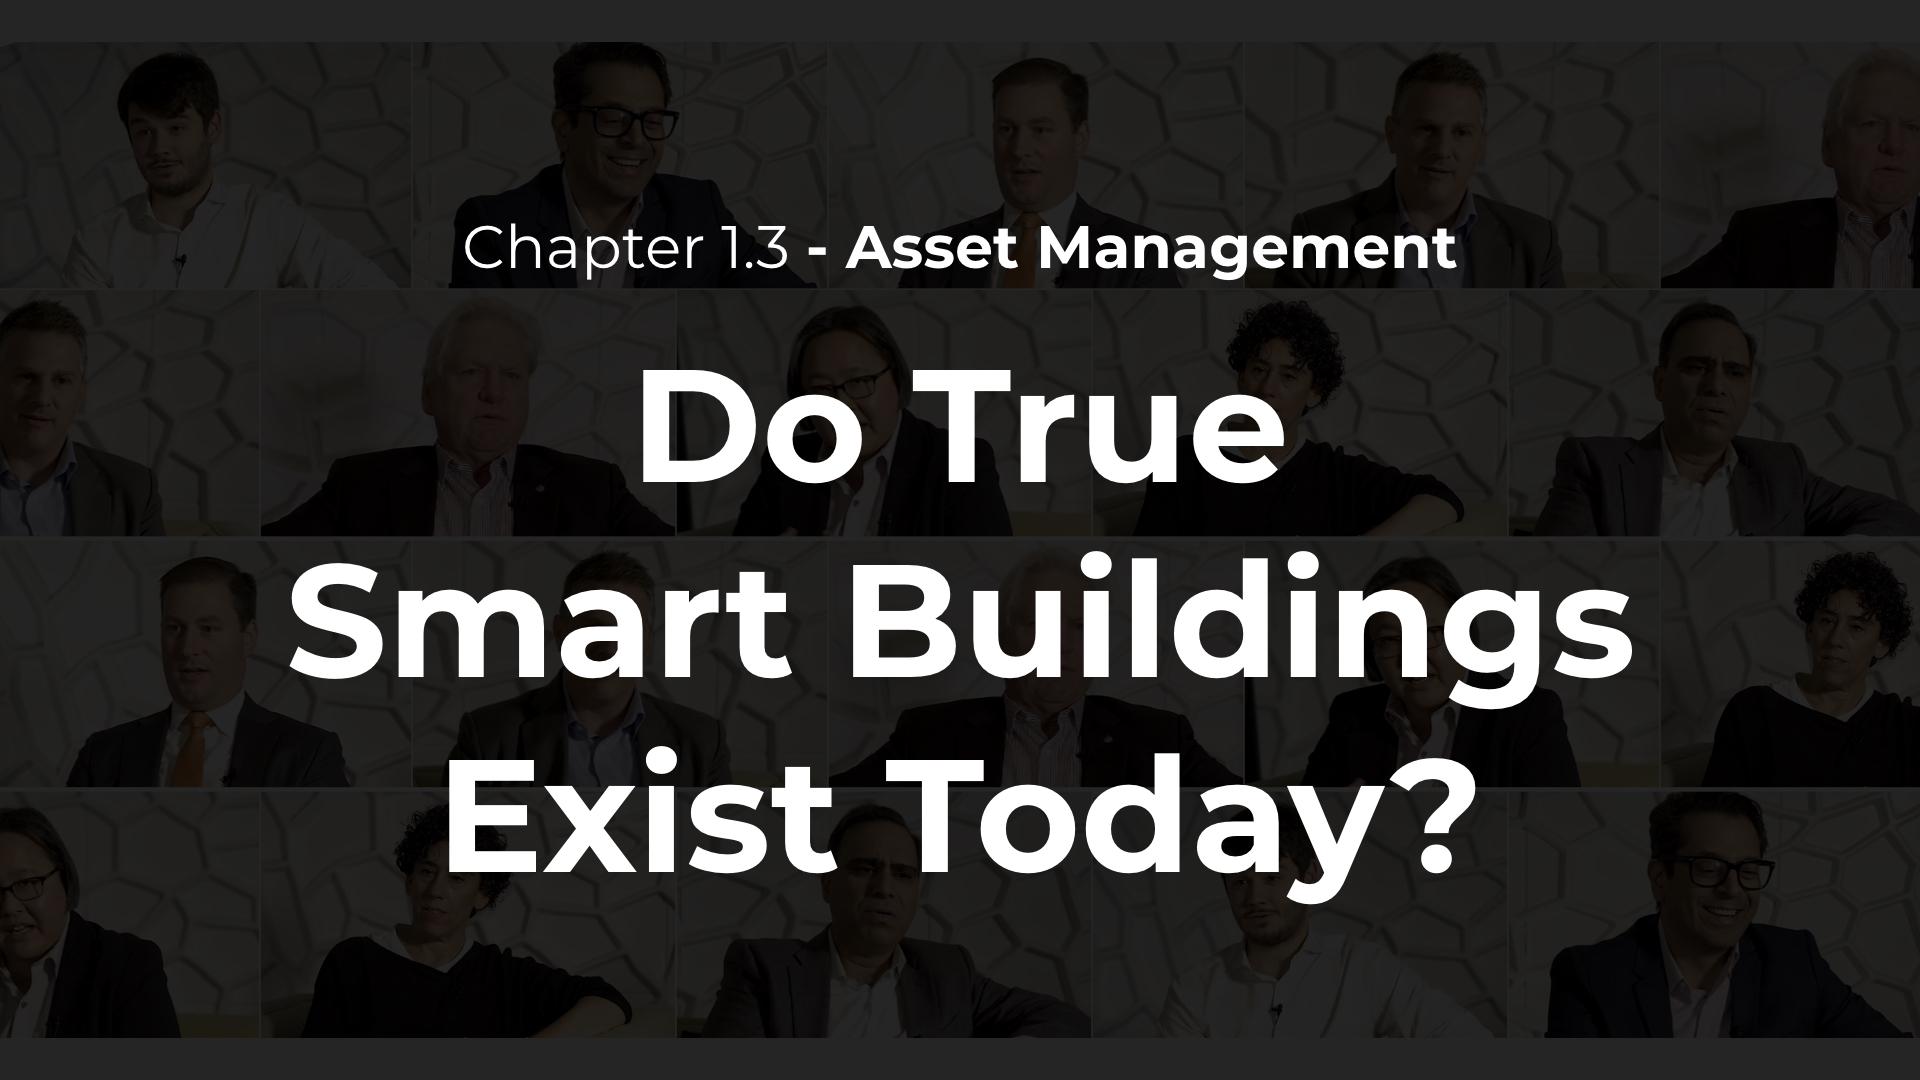 1.3 - Do True Smart Buildings Exist Today?